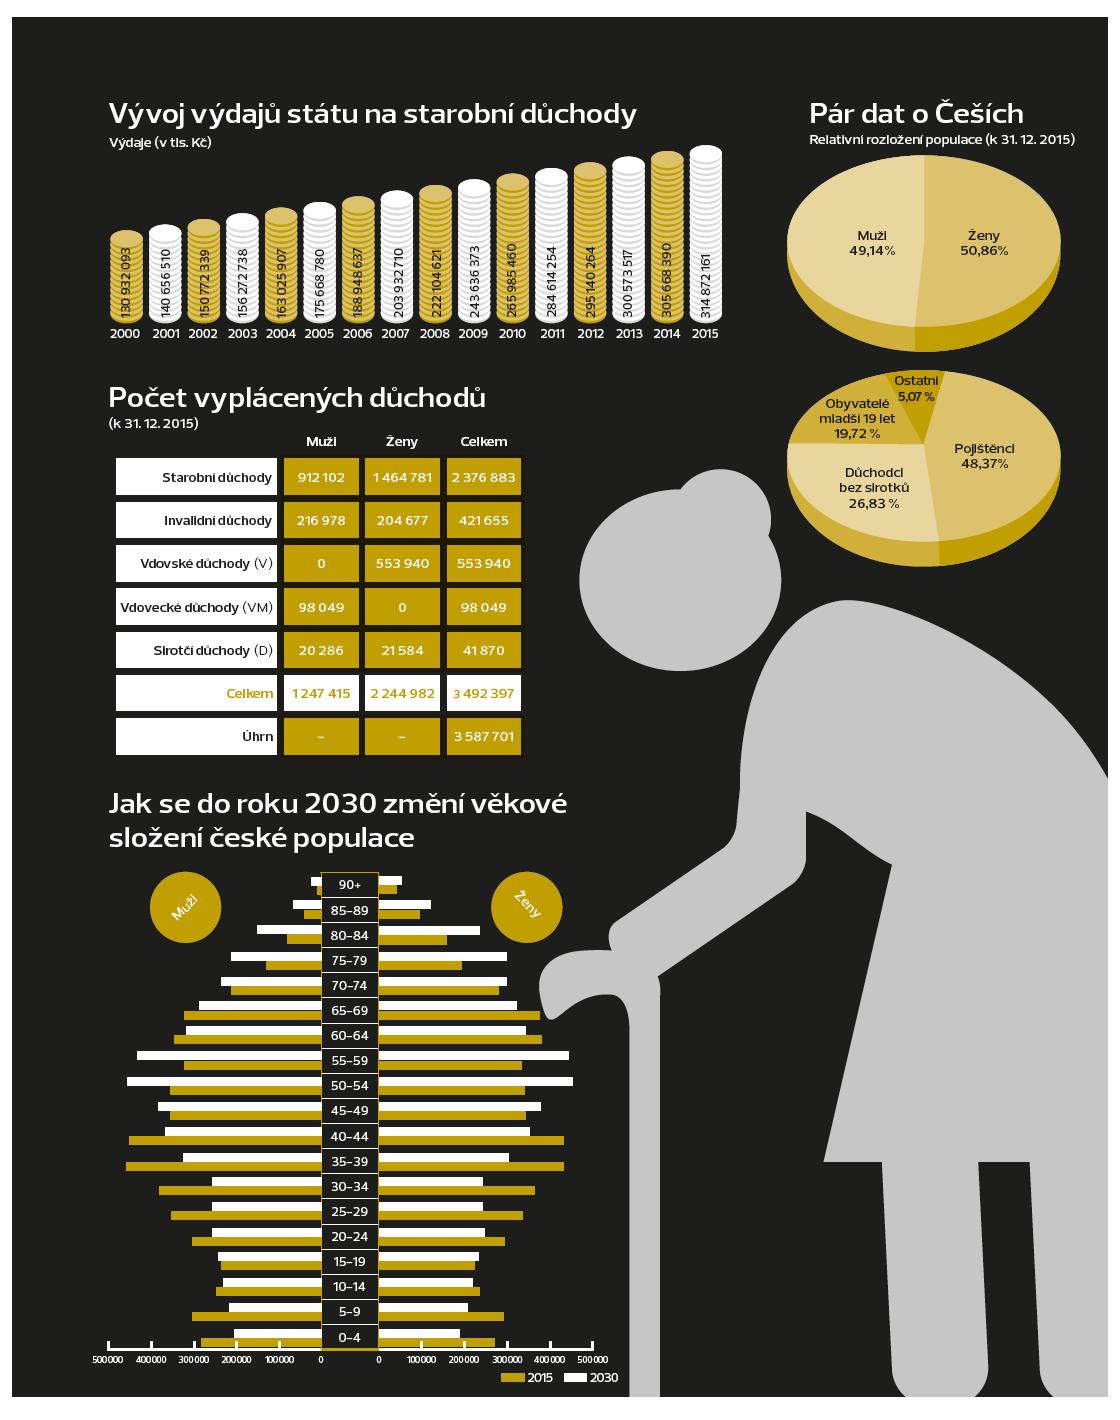 infografika_starnuti_duchody2